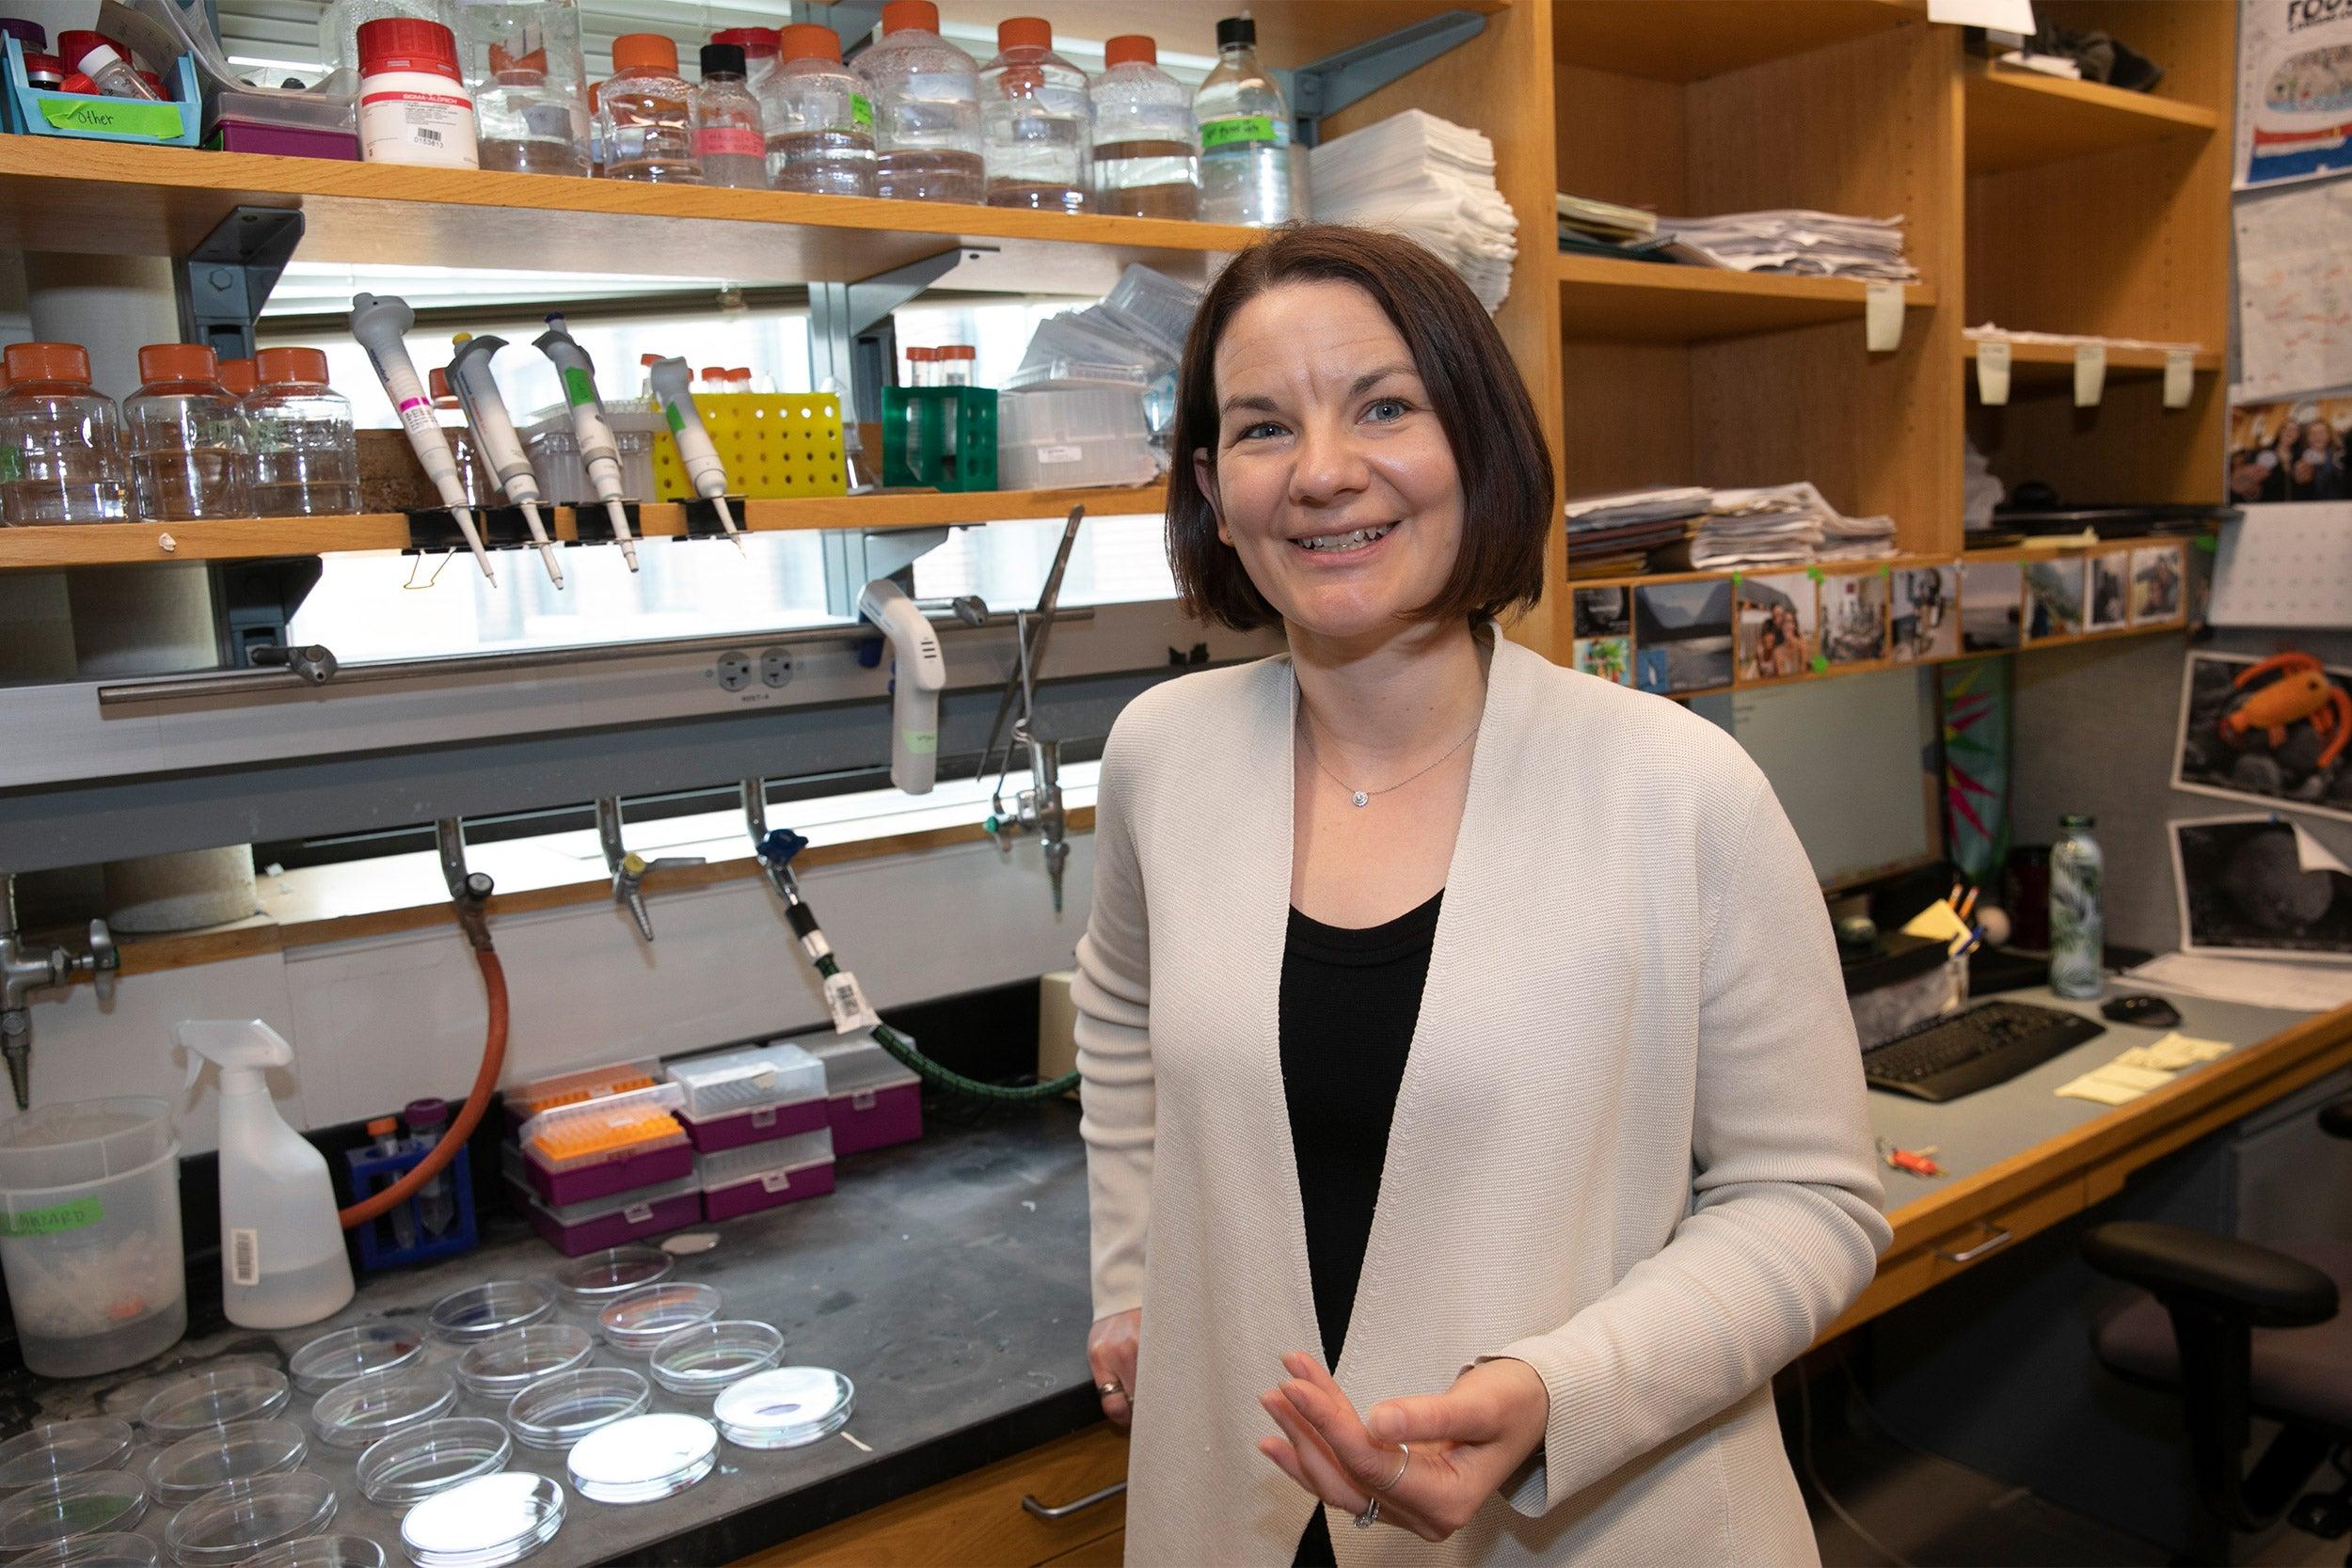 Emily Balskus in her lab.